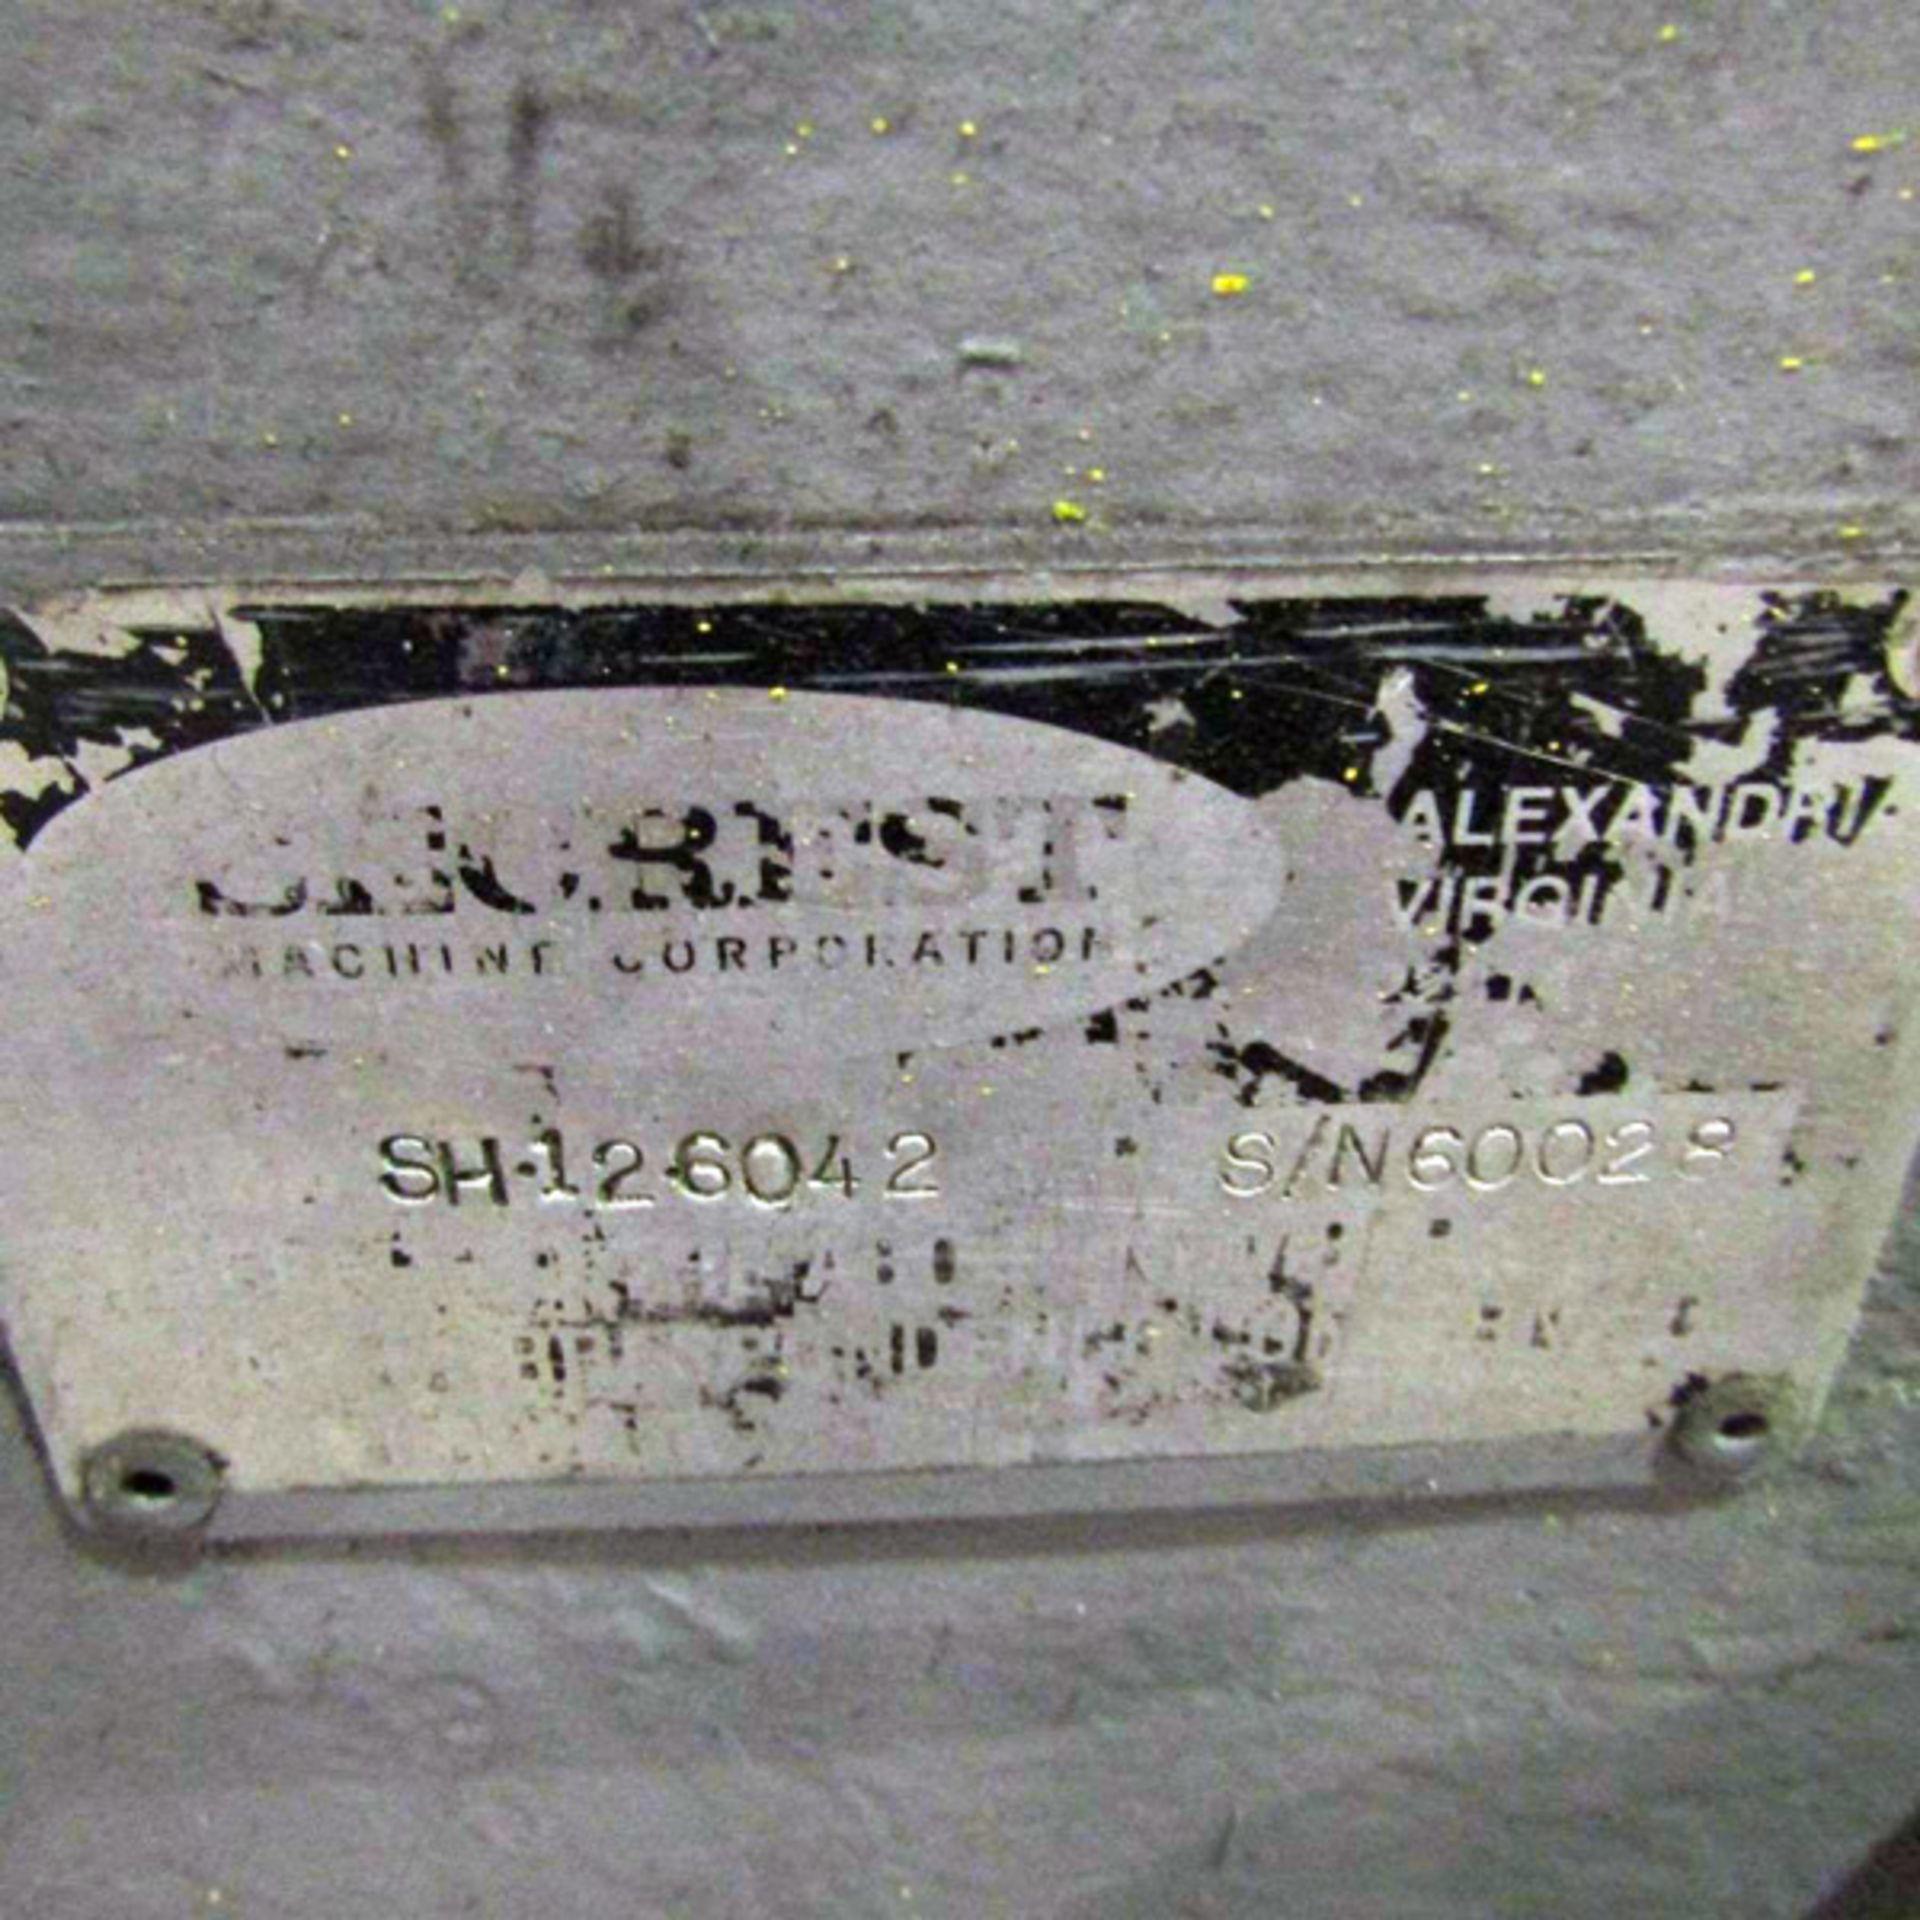 "Lot 41 - Seacrest Cut To Length Line | 30,000 Lb. x 60"" x 12 Ga., Mdl: CR.H.3048S, S/N: 60040 - 8422JVP"